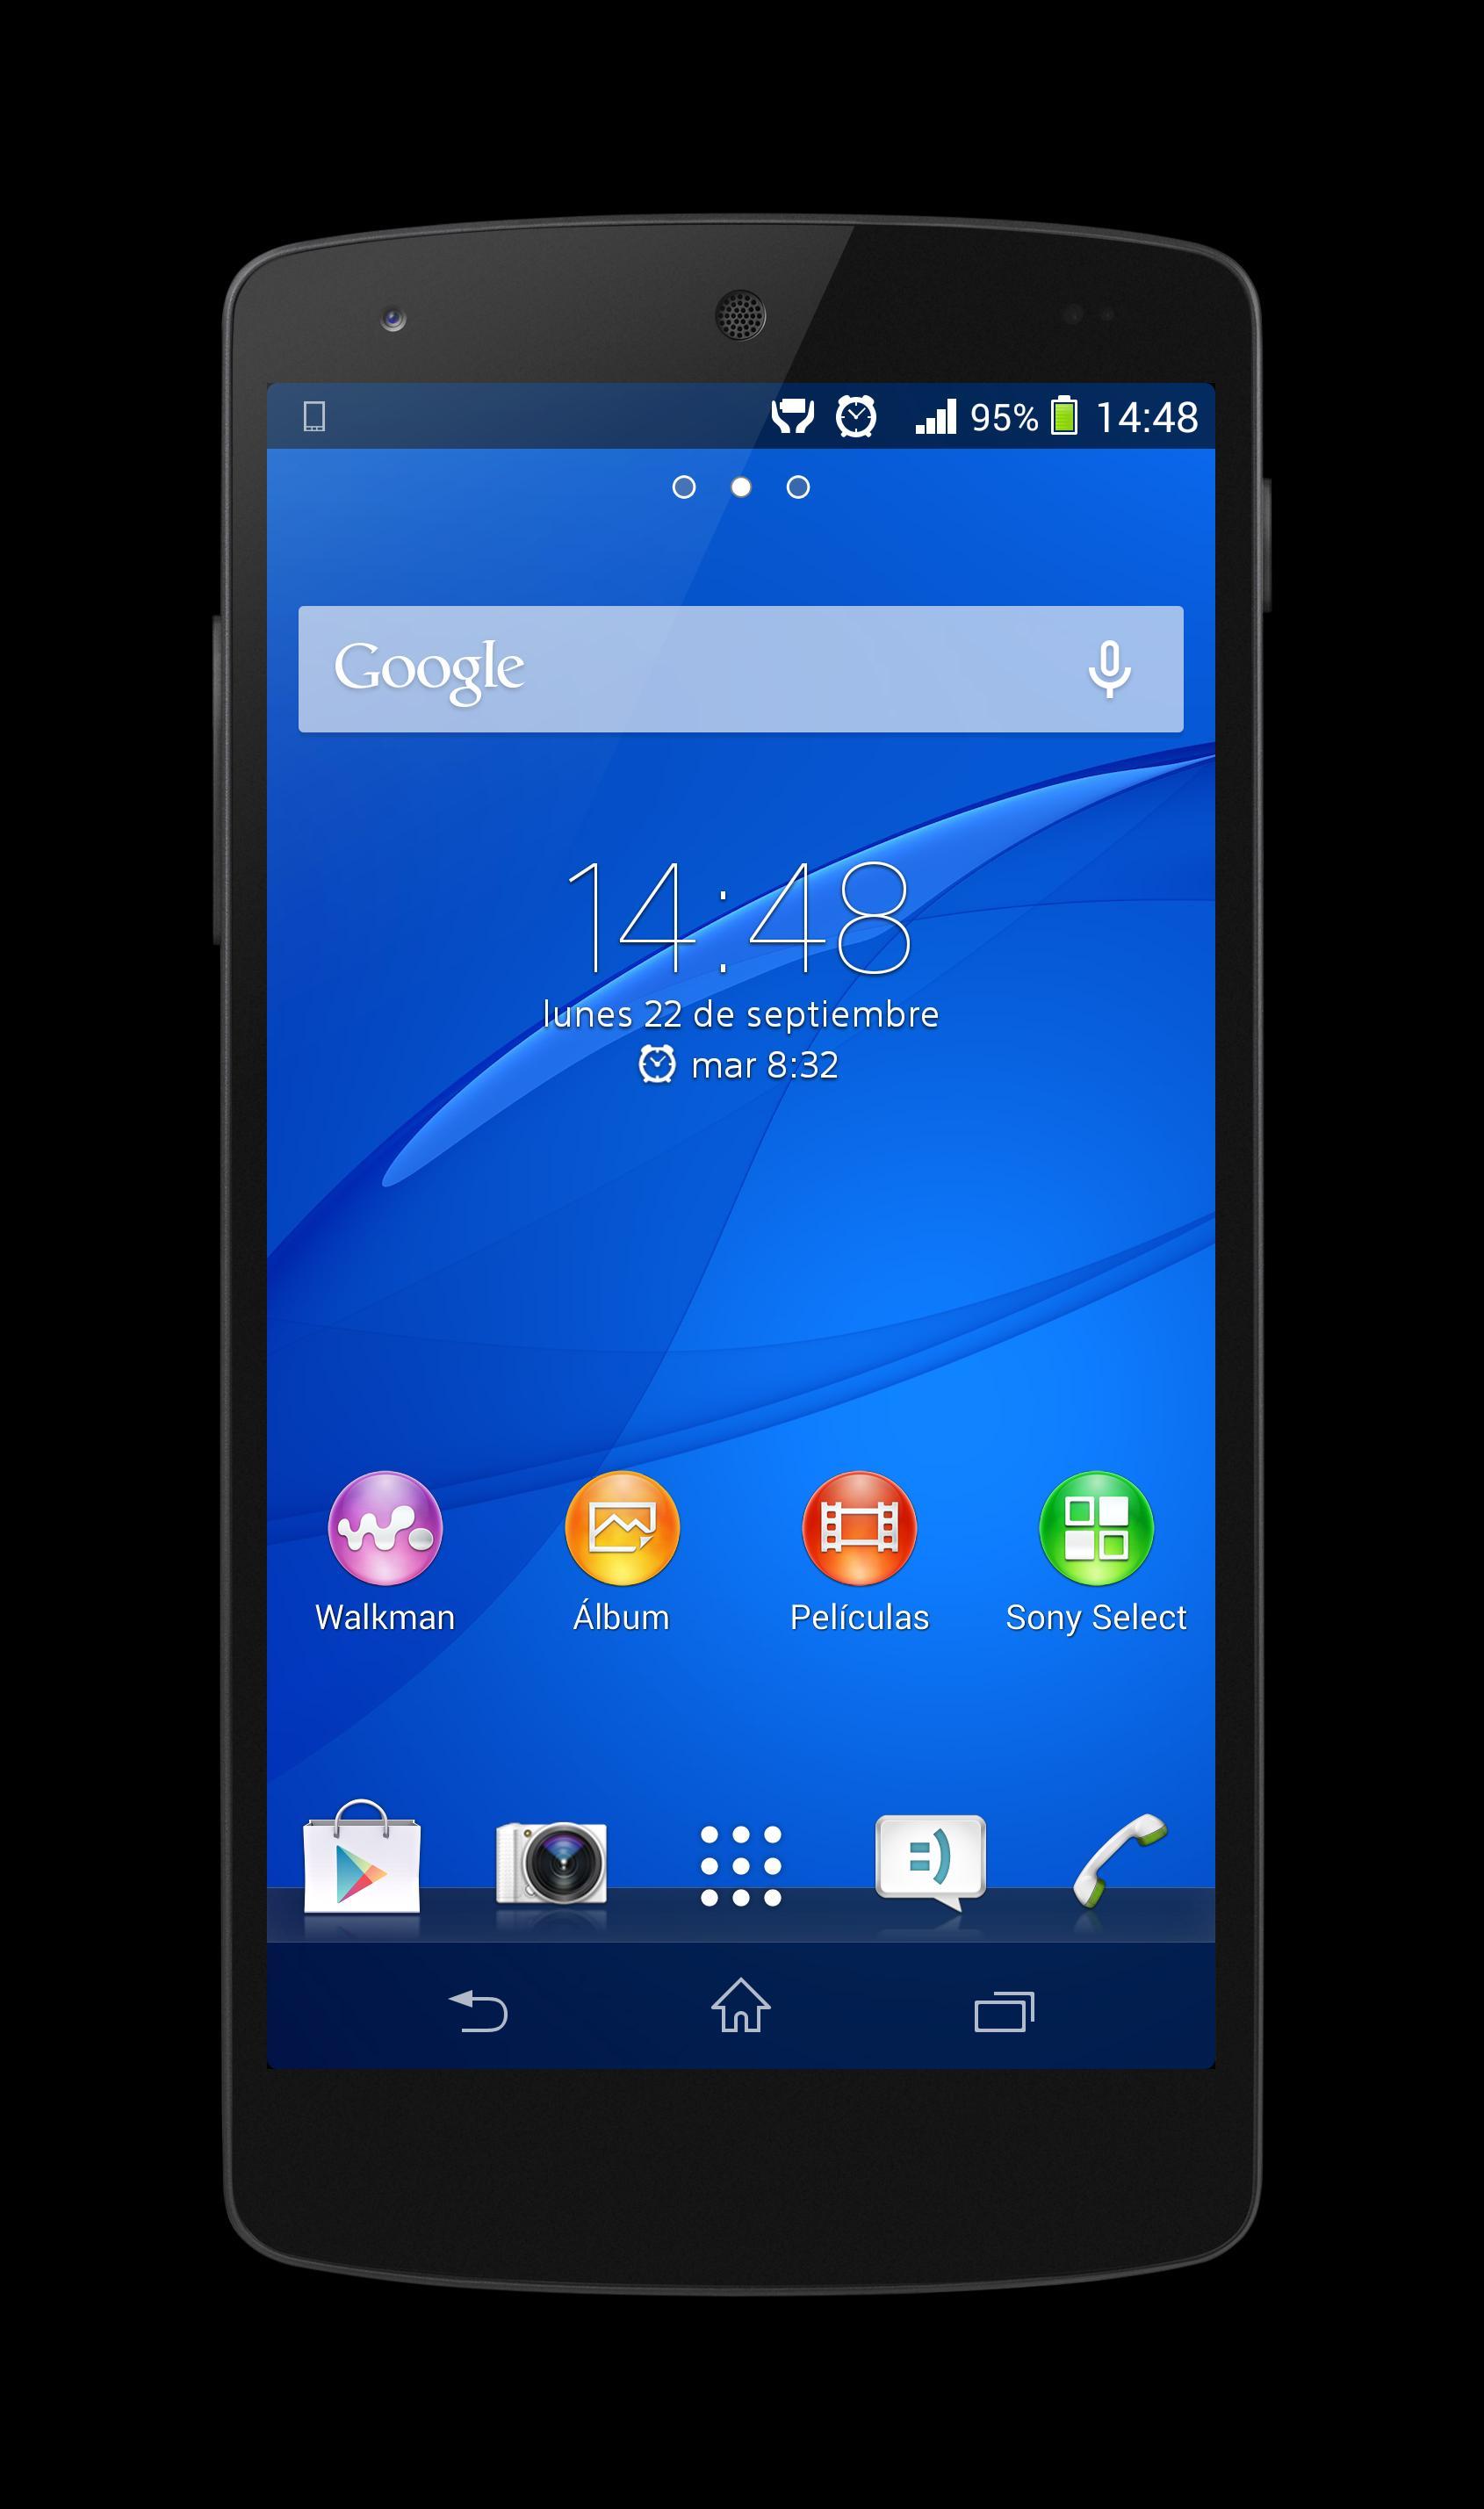 Android 用の Xperia Wallpaper Hd Apk をダウンロード